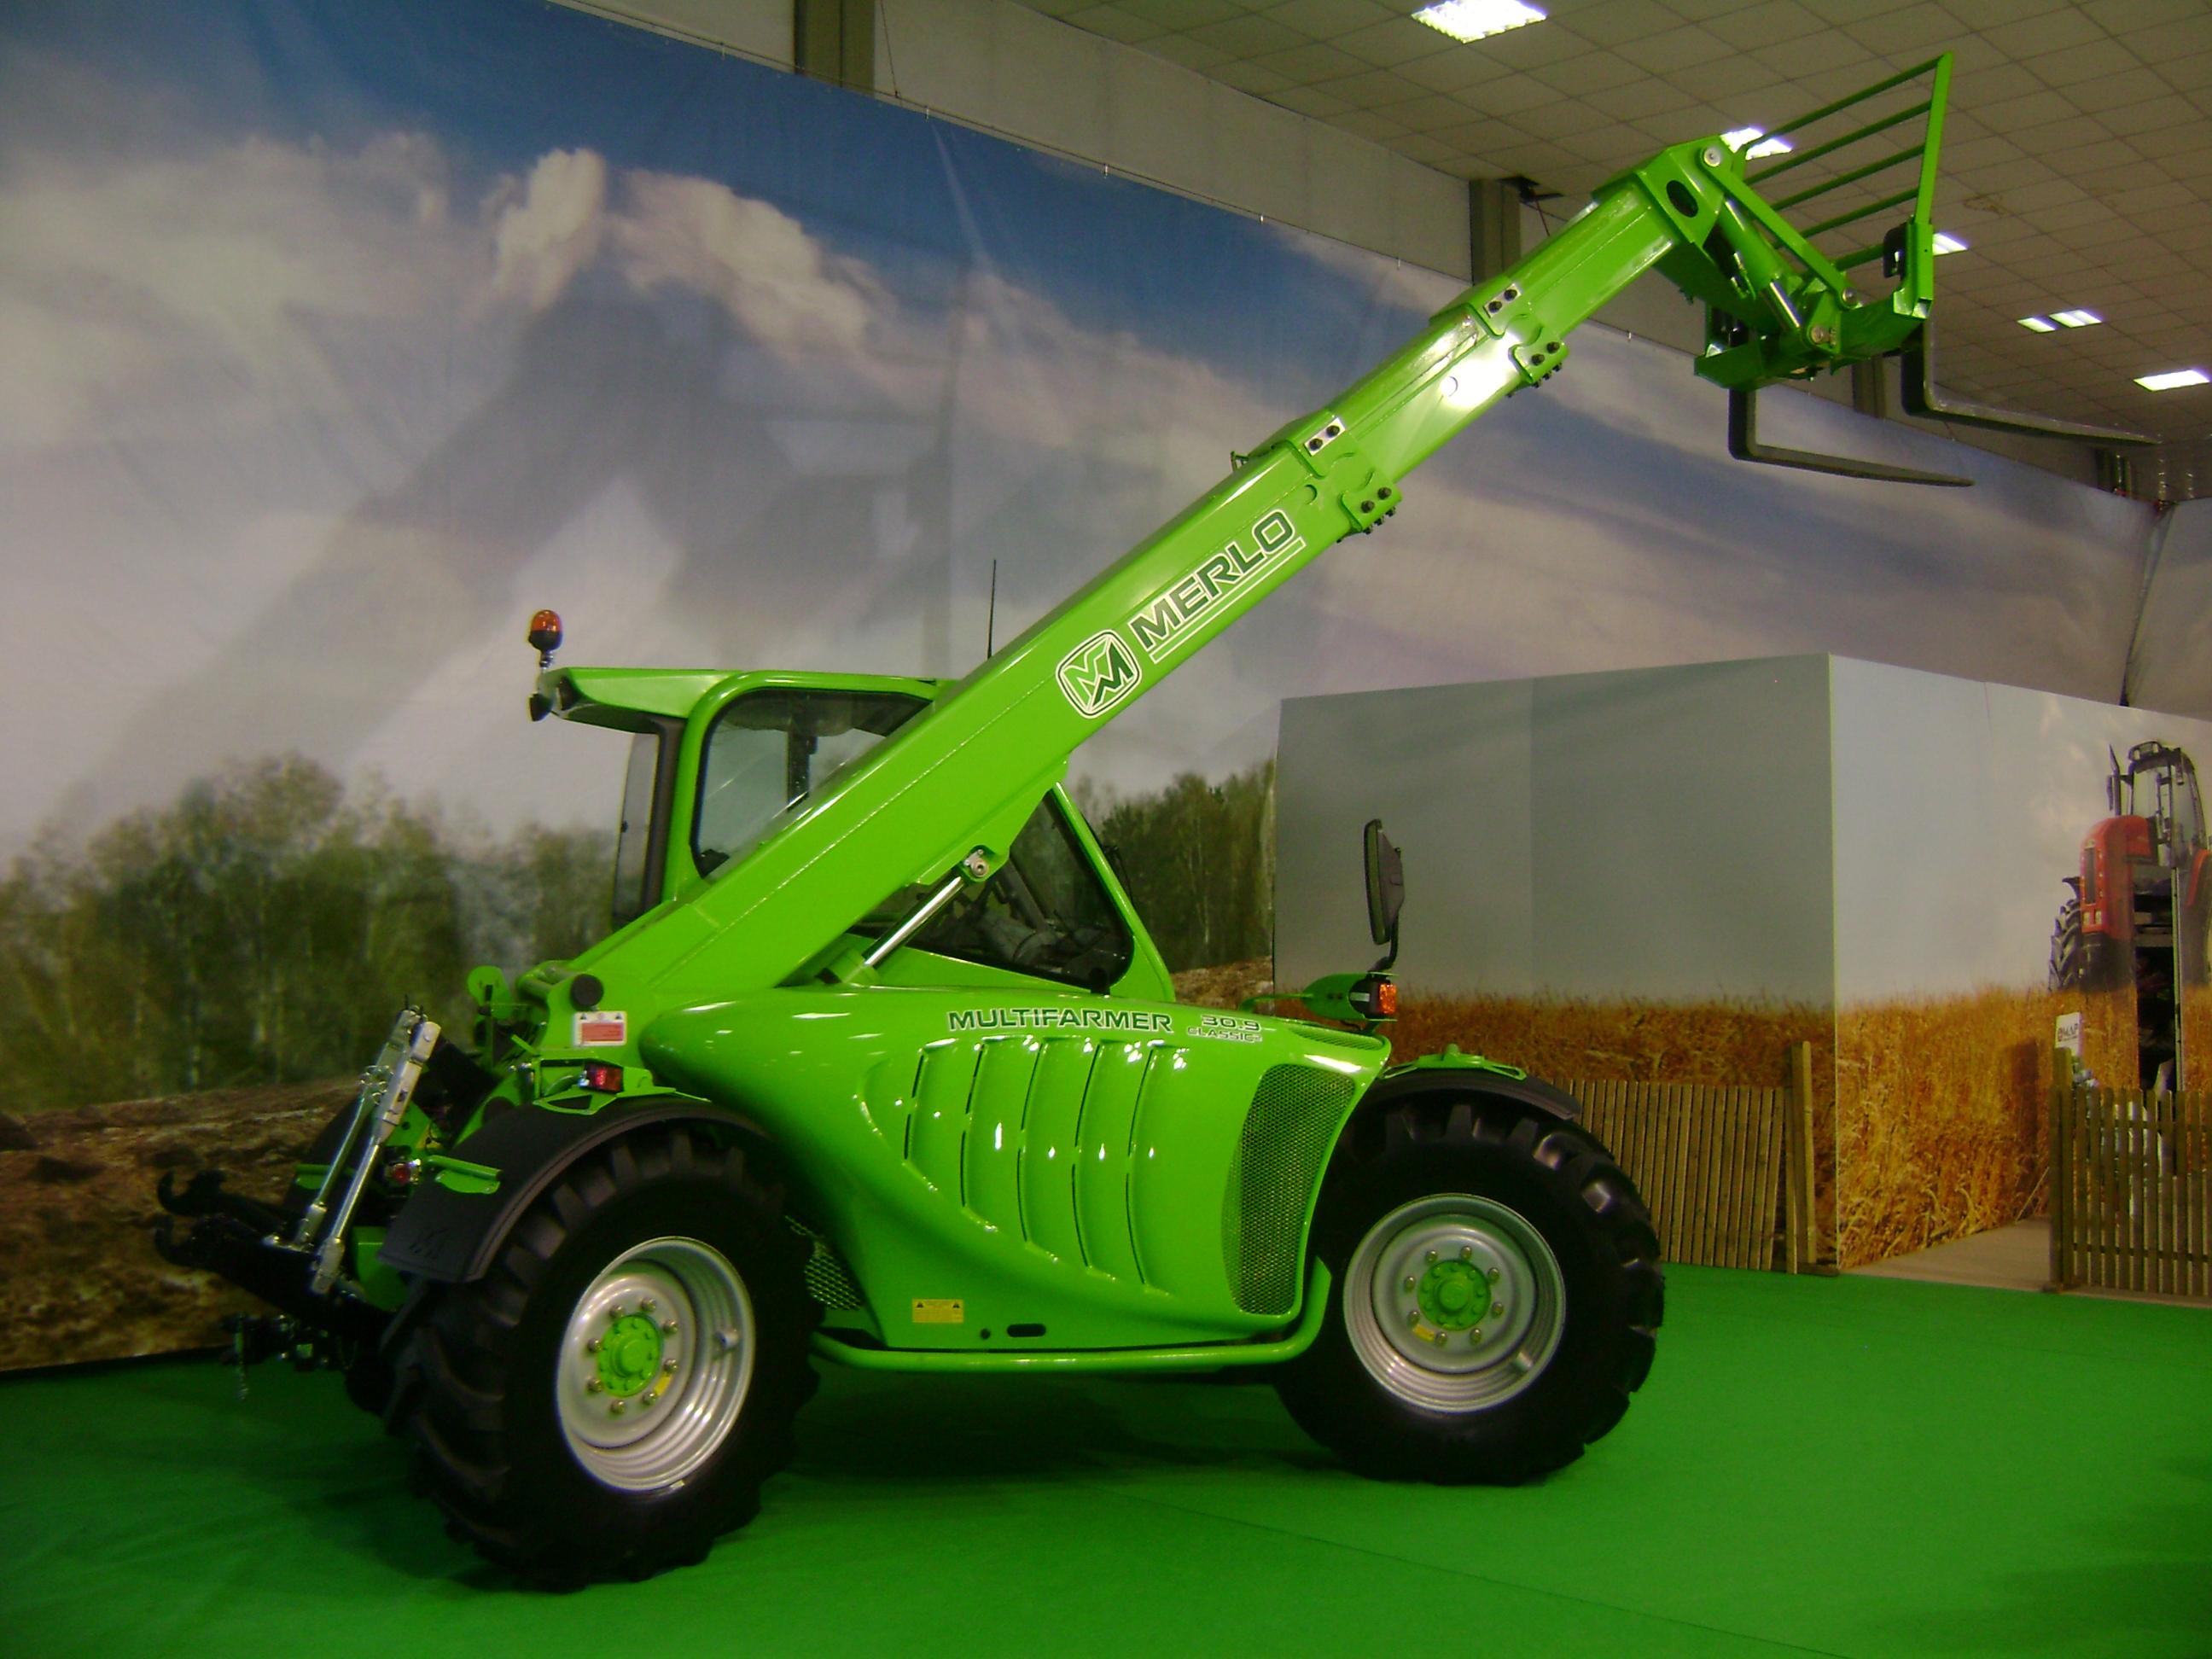 File:MERLO Multifarmer MF30.9 Classic2 tractor-telehandler at IndAgra Farm  Romexpo 2010